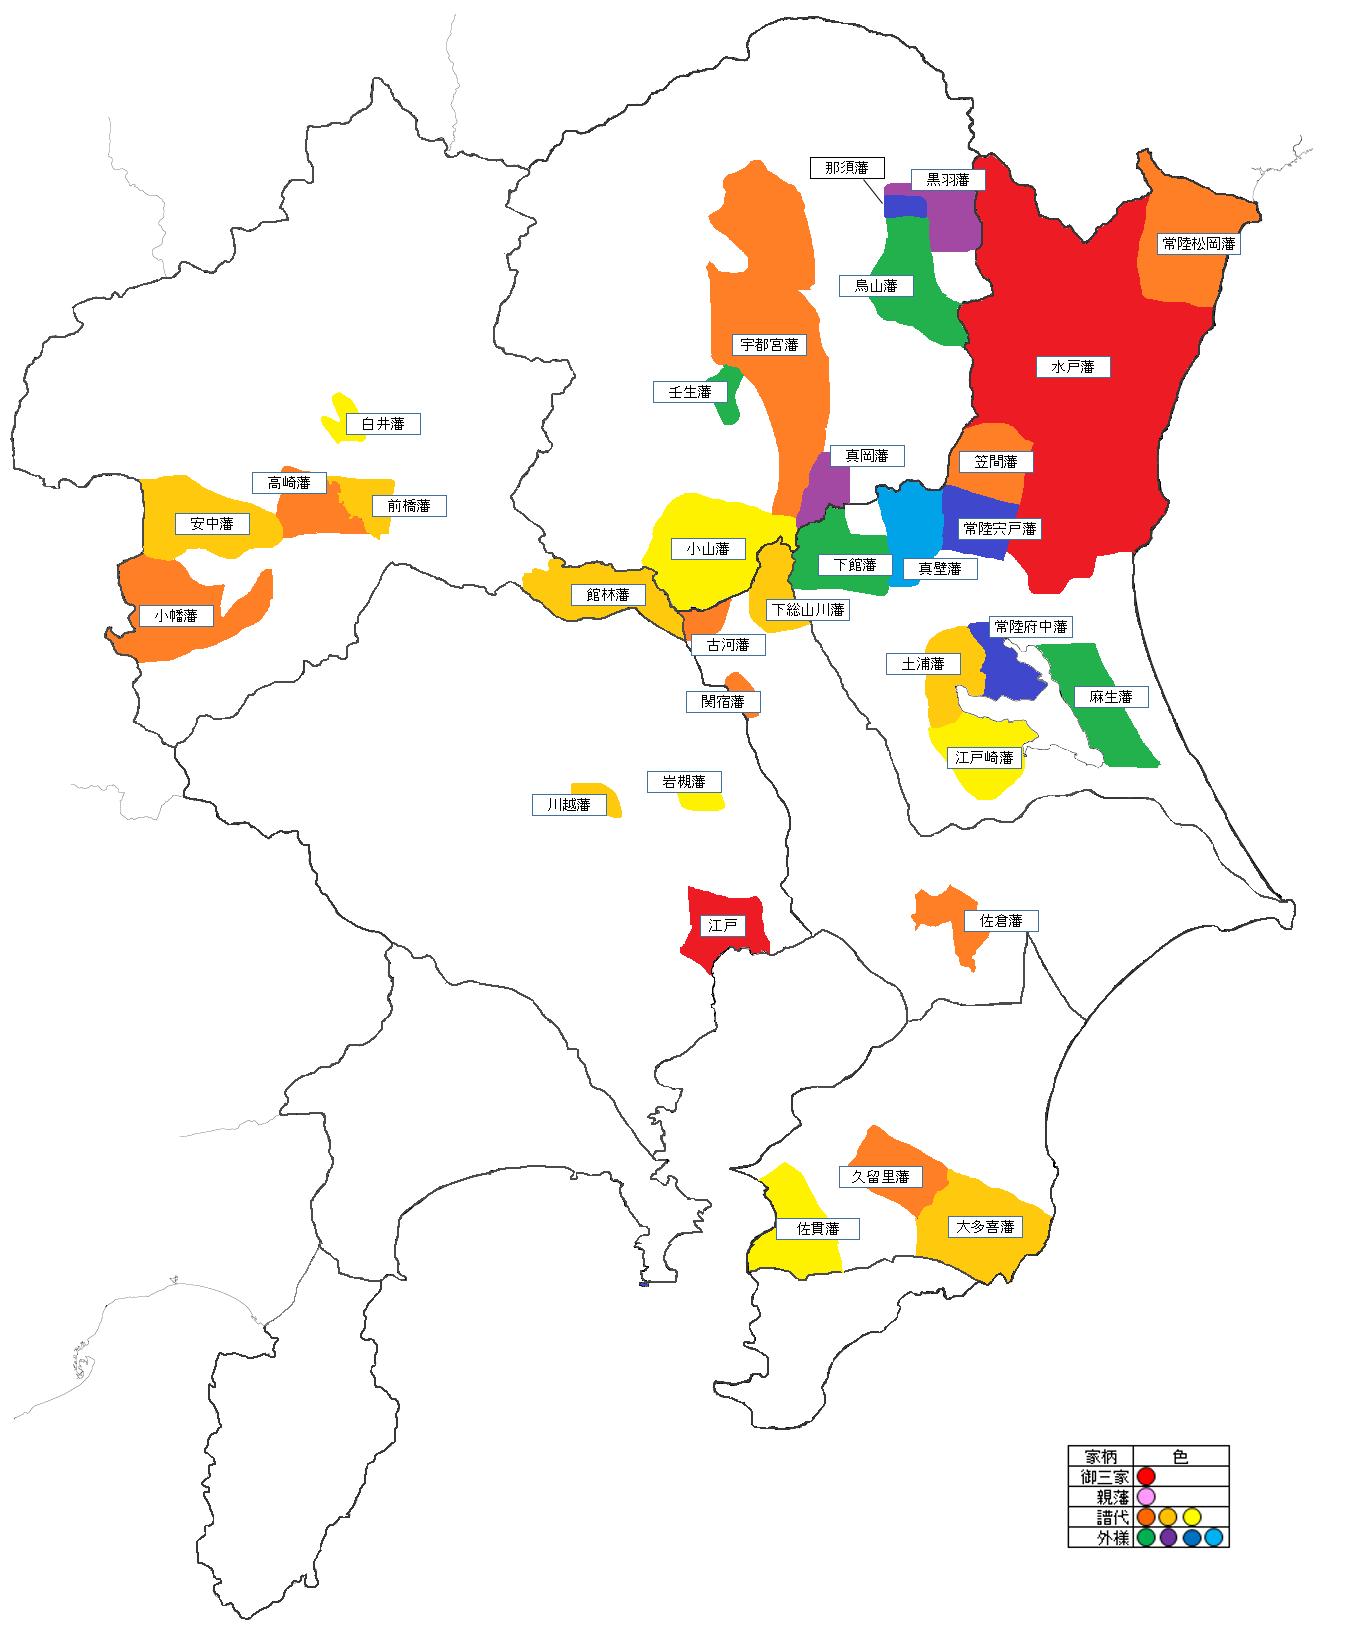 関東地方の大名配置図 大阪の陣後 - 江戸時代の大名領地Map